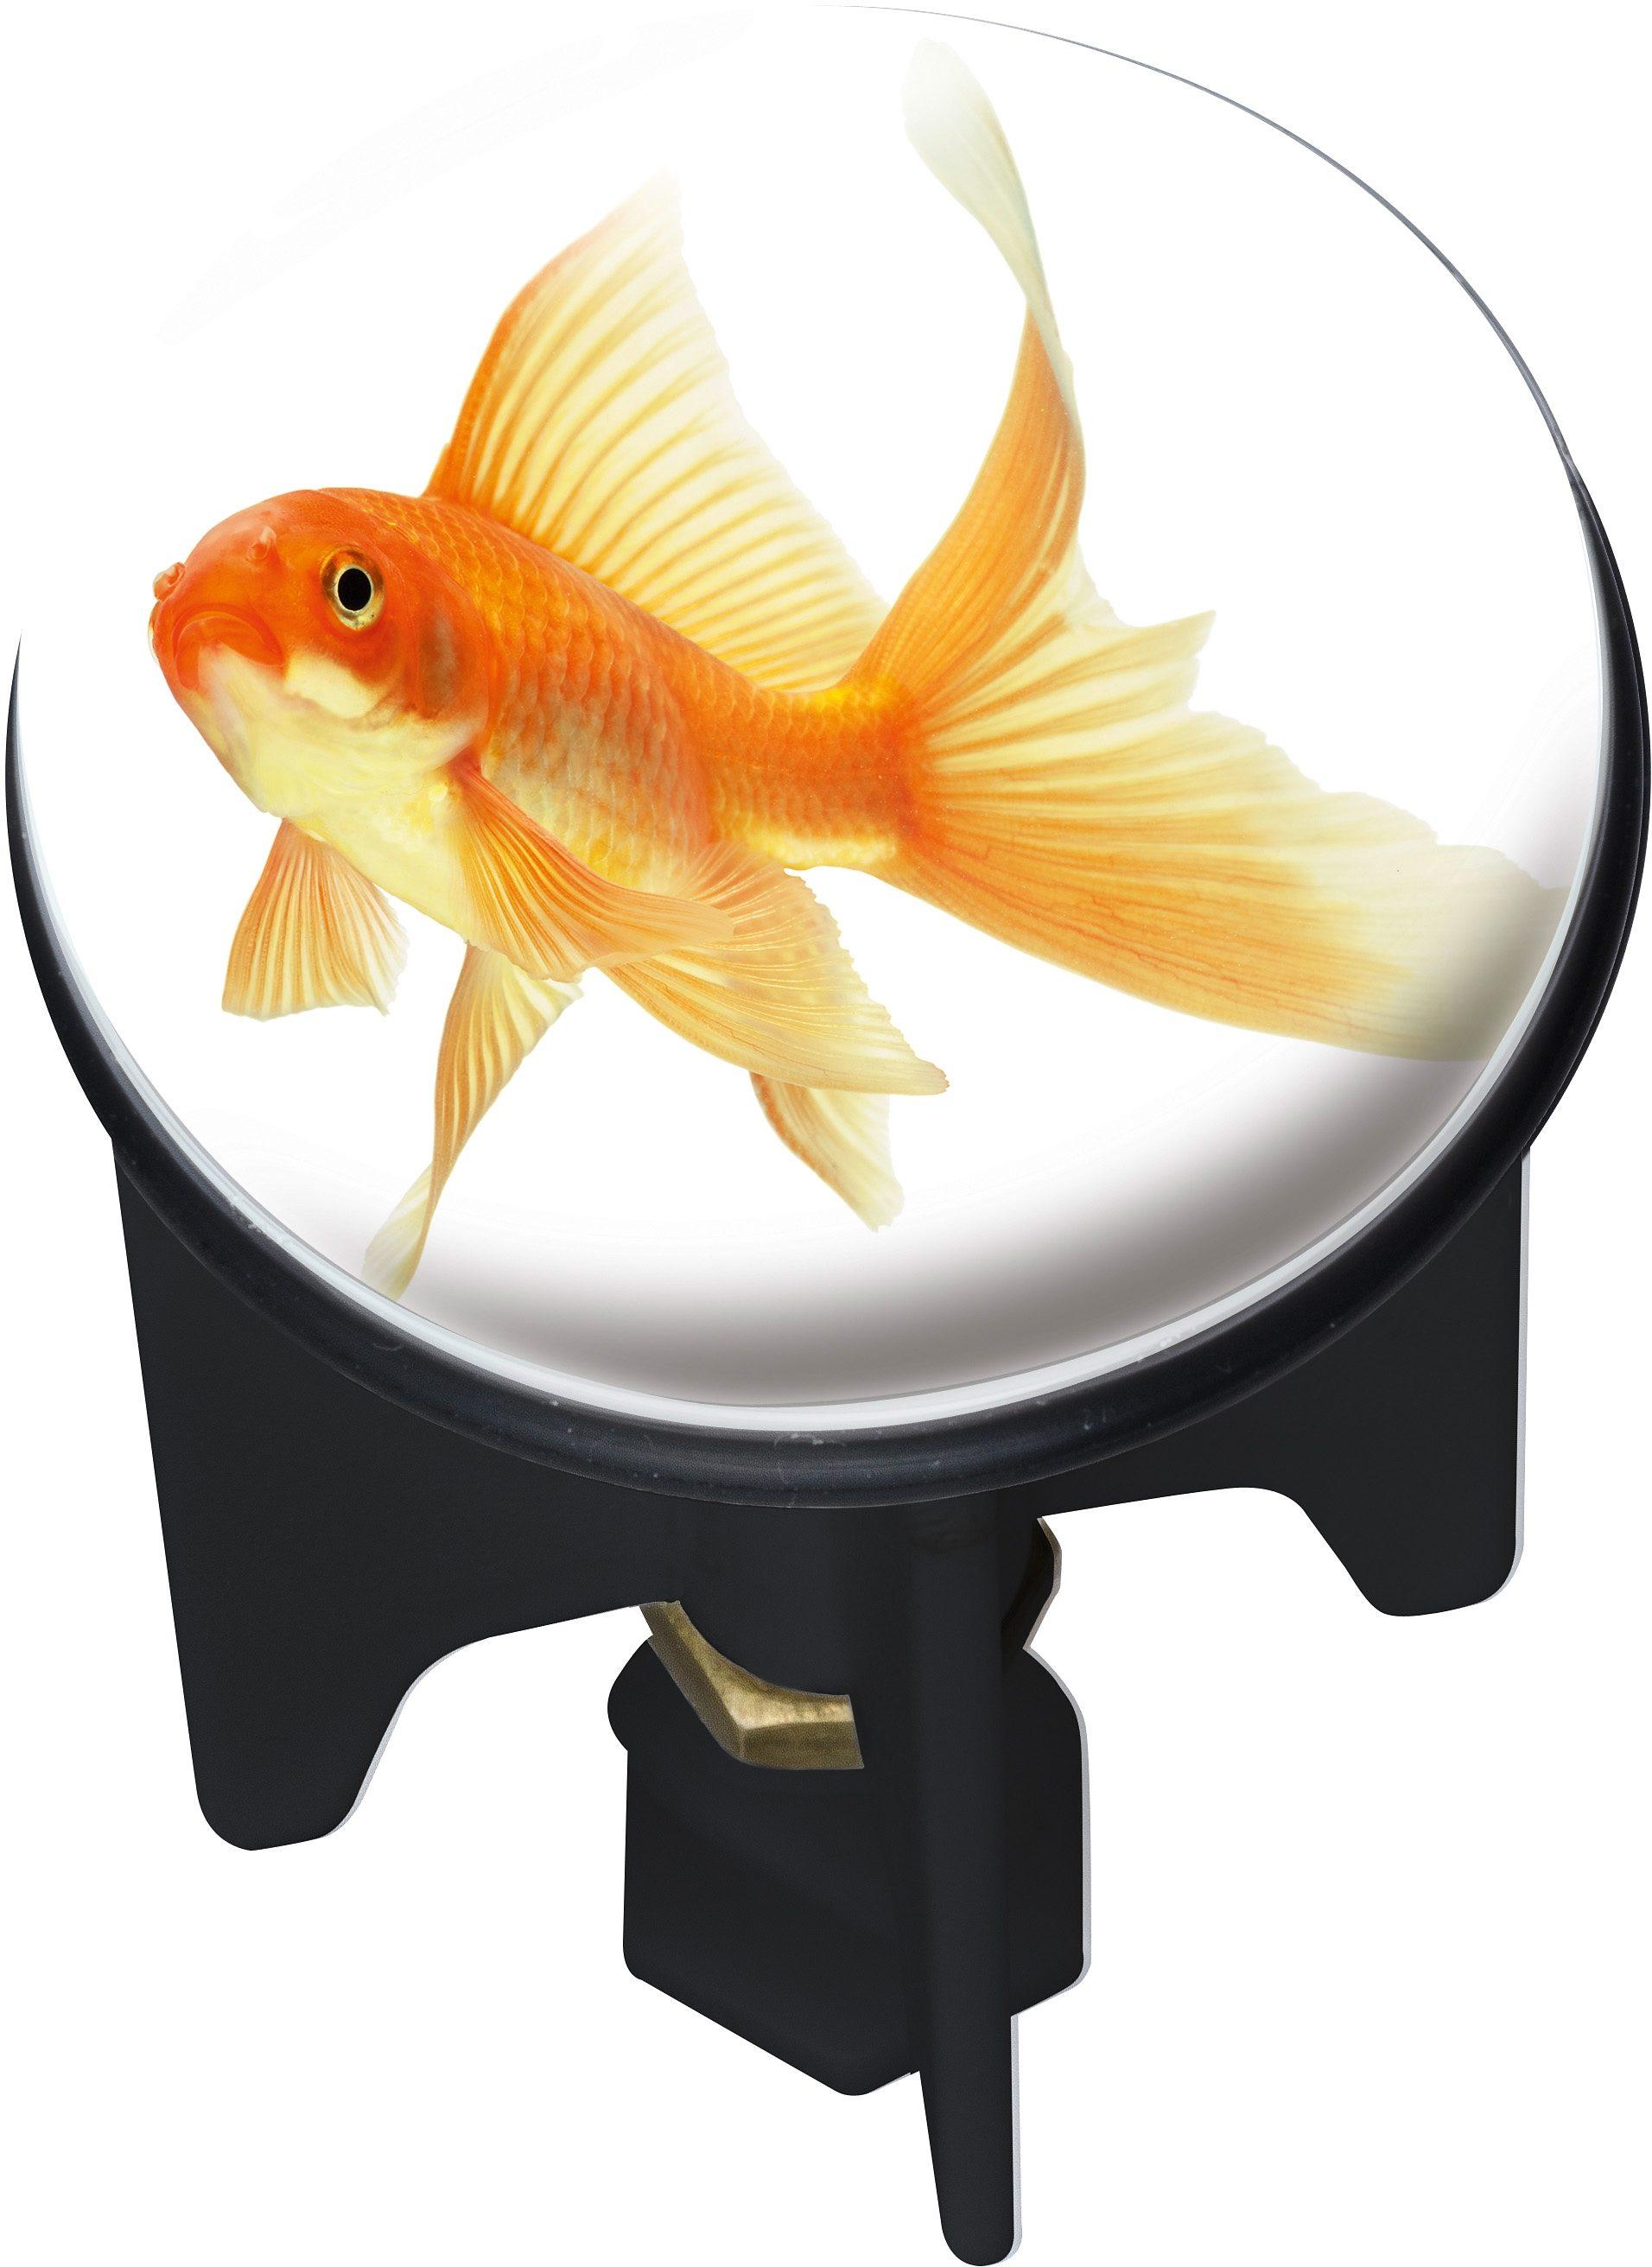 Abfluss-Stopfen, Wenko, »Pluggy Fisch«